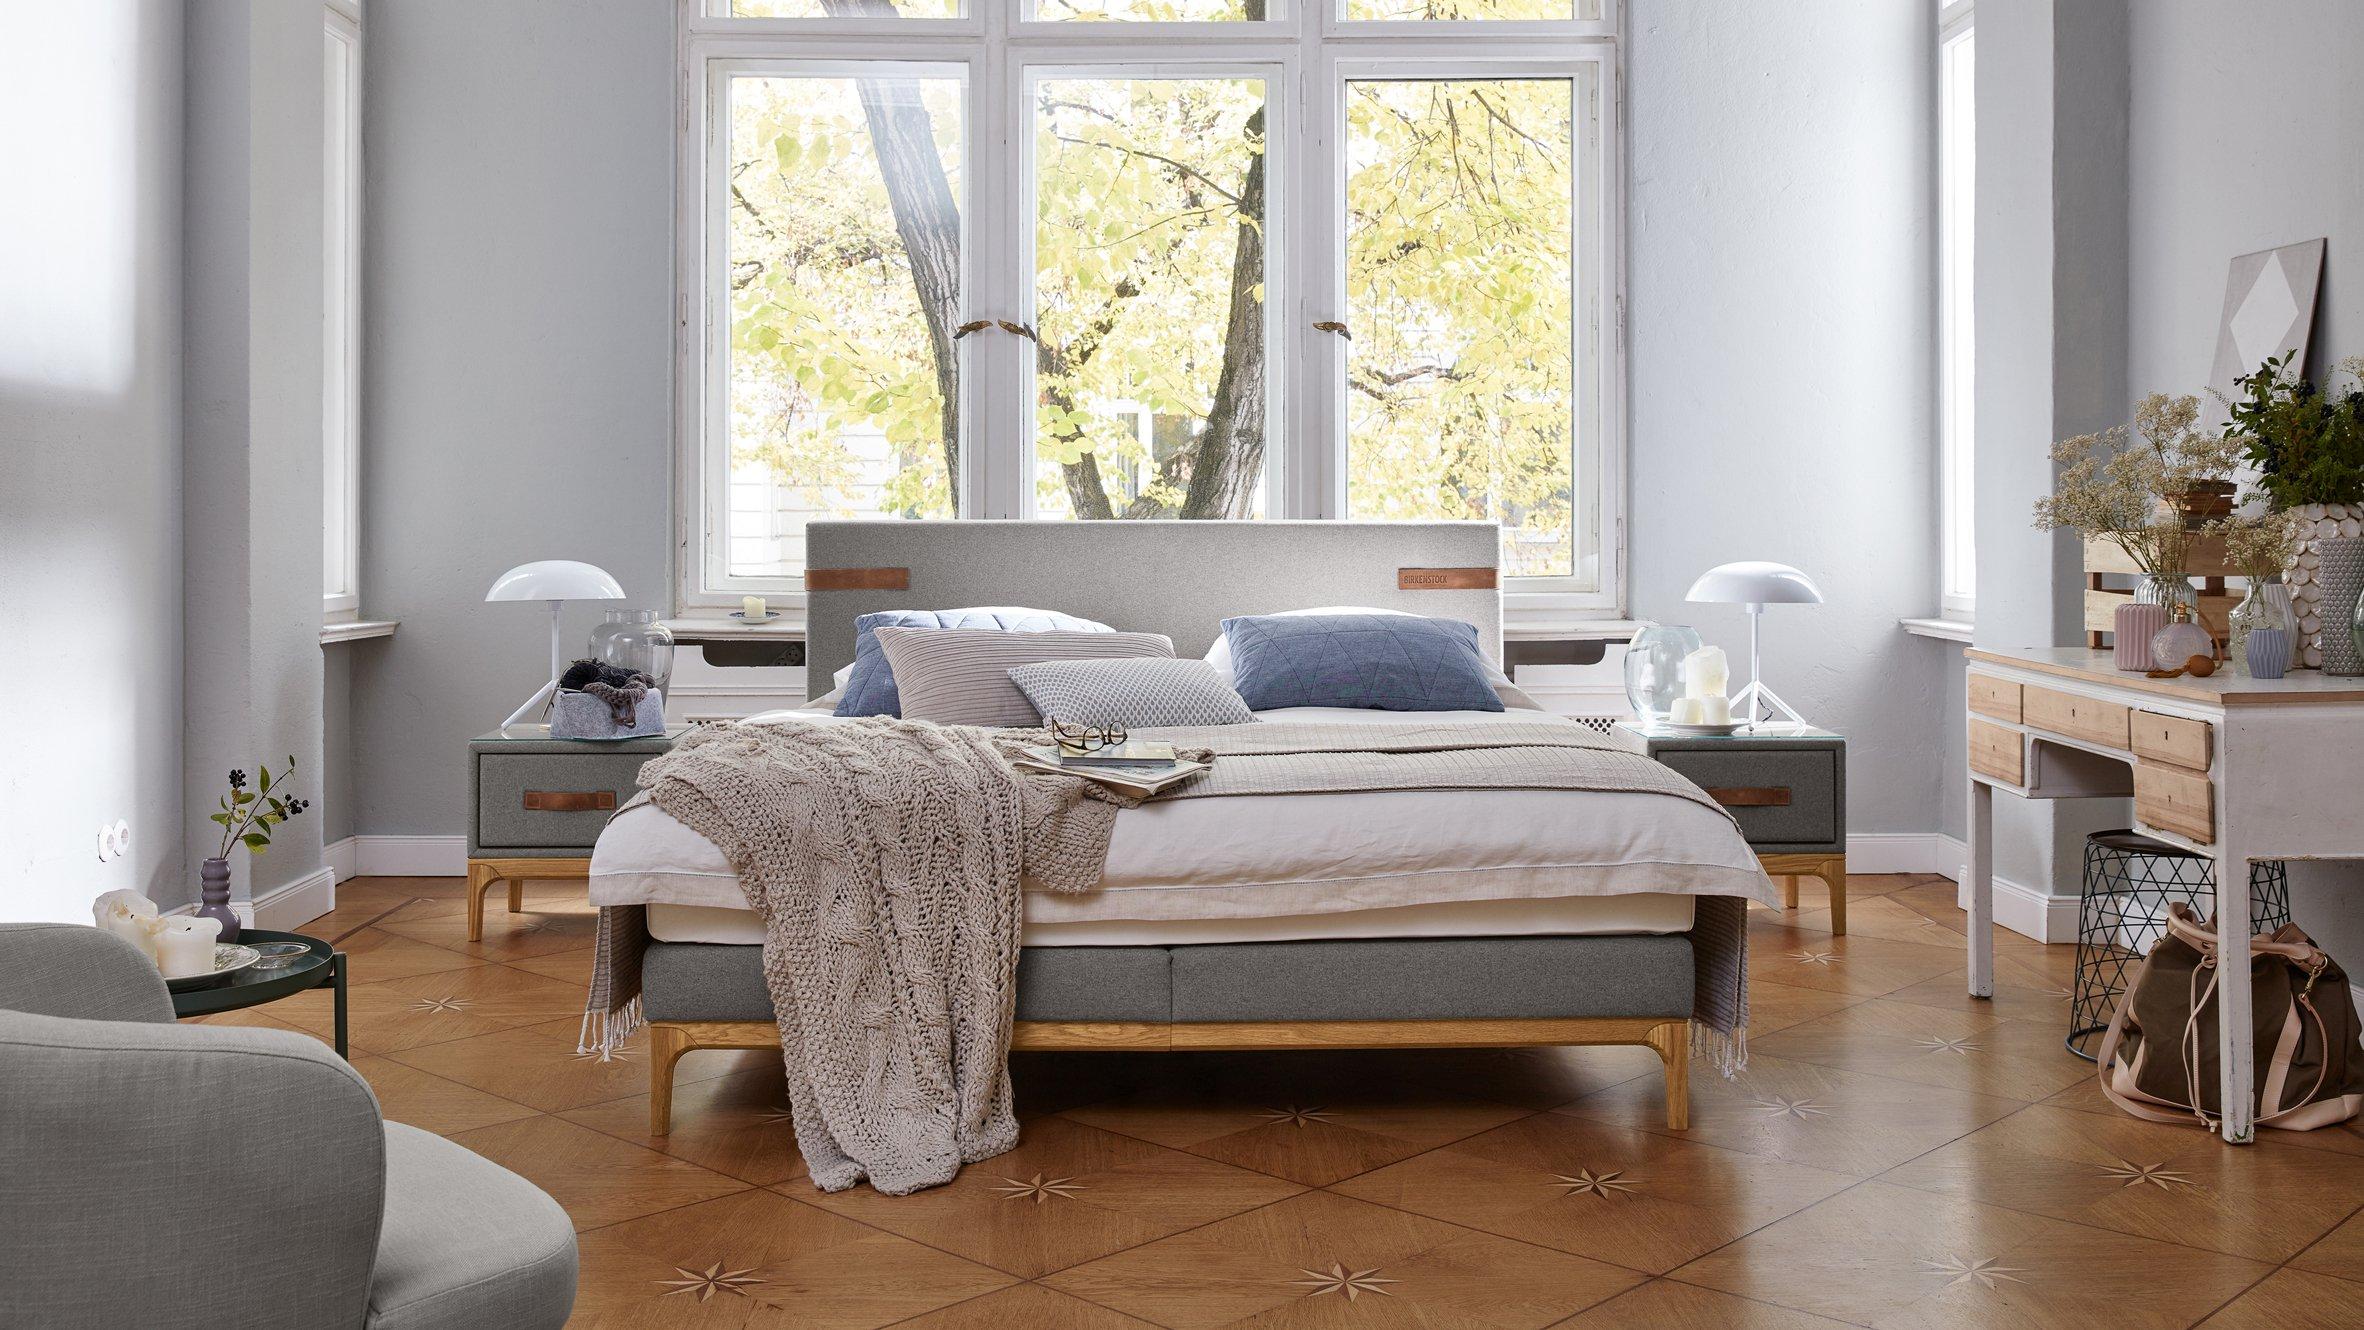 Footwear Company Birkenstock Jumps Into Bed Business